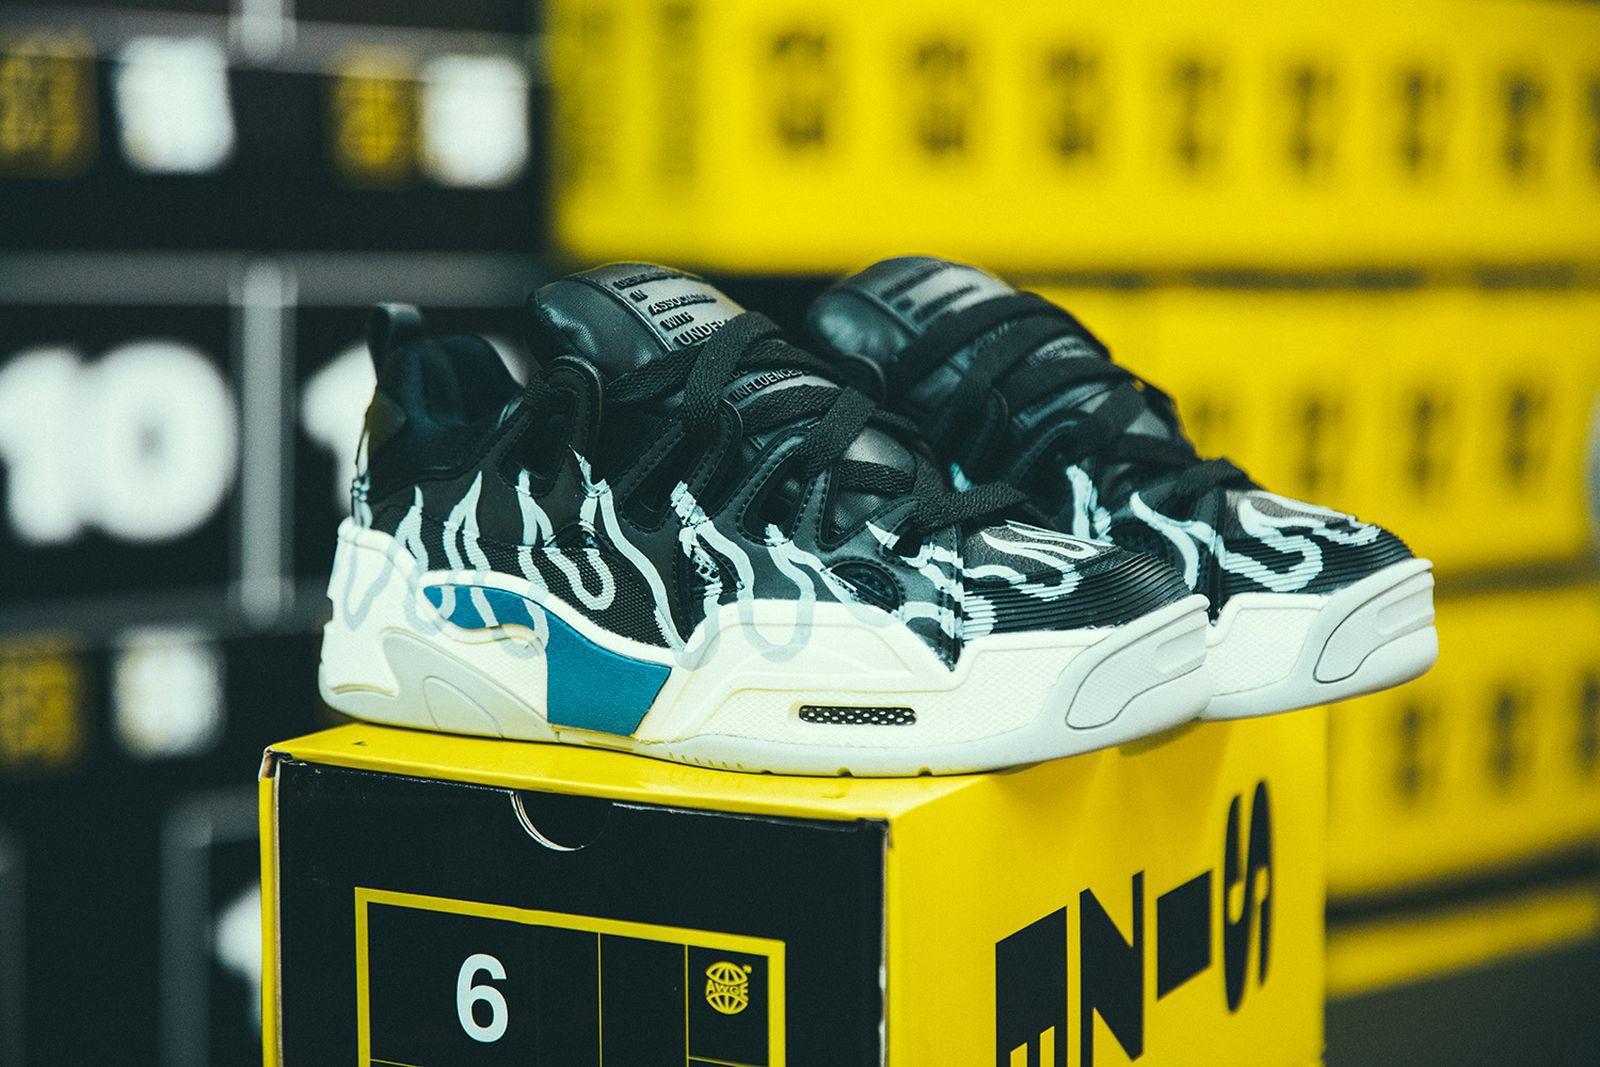 ASAP Rocky Under Armour AWGE Sneakers A$AP Rocky Osiris D3